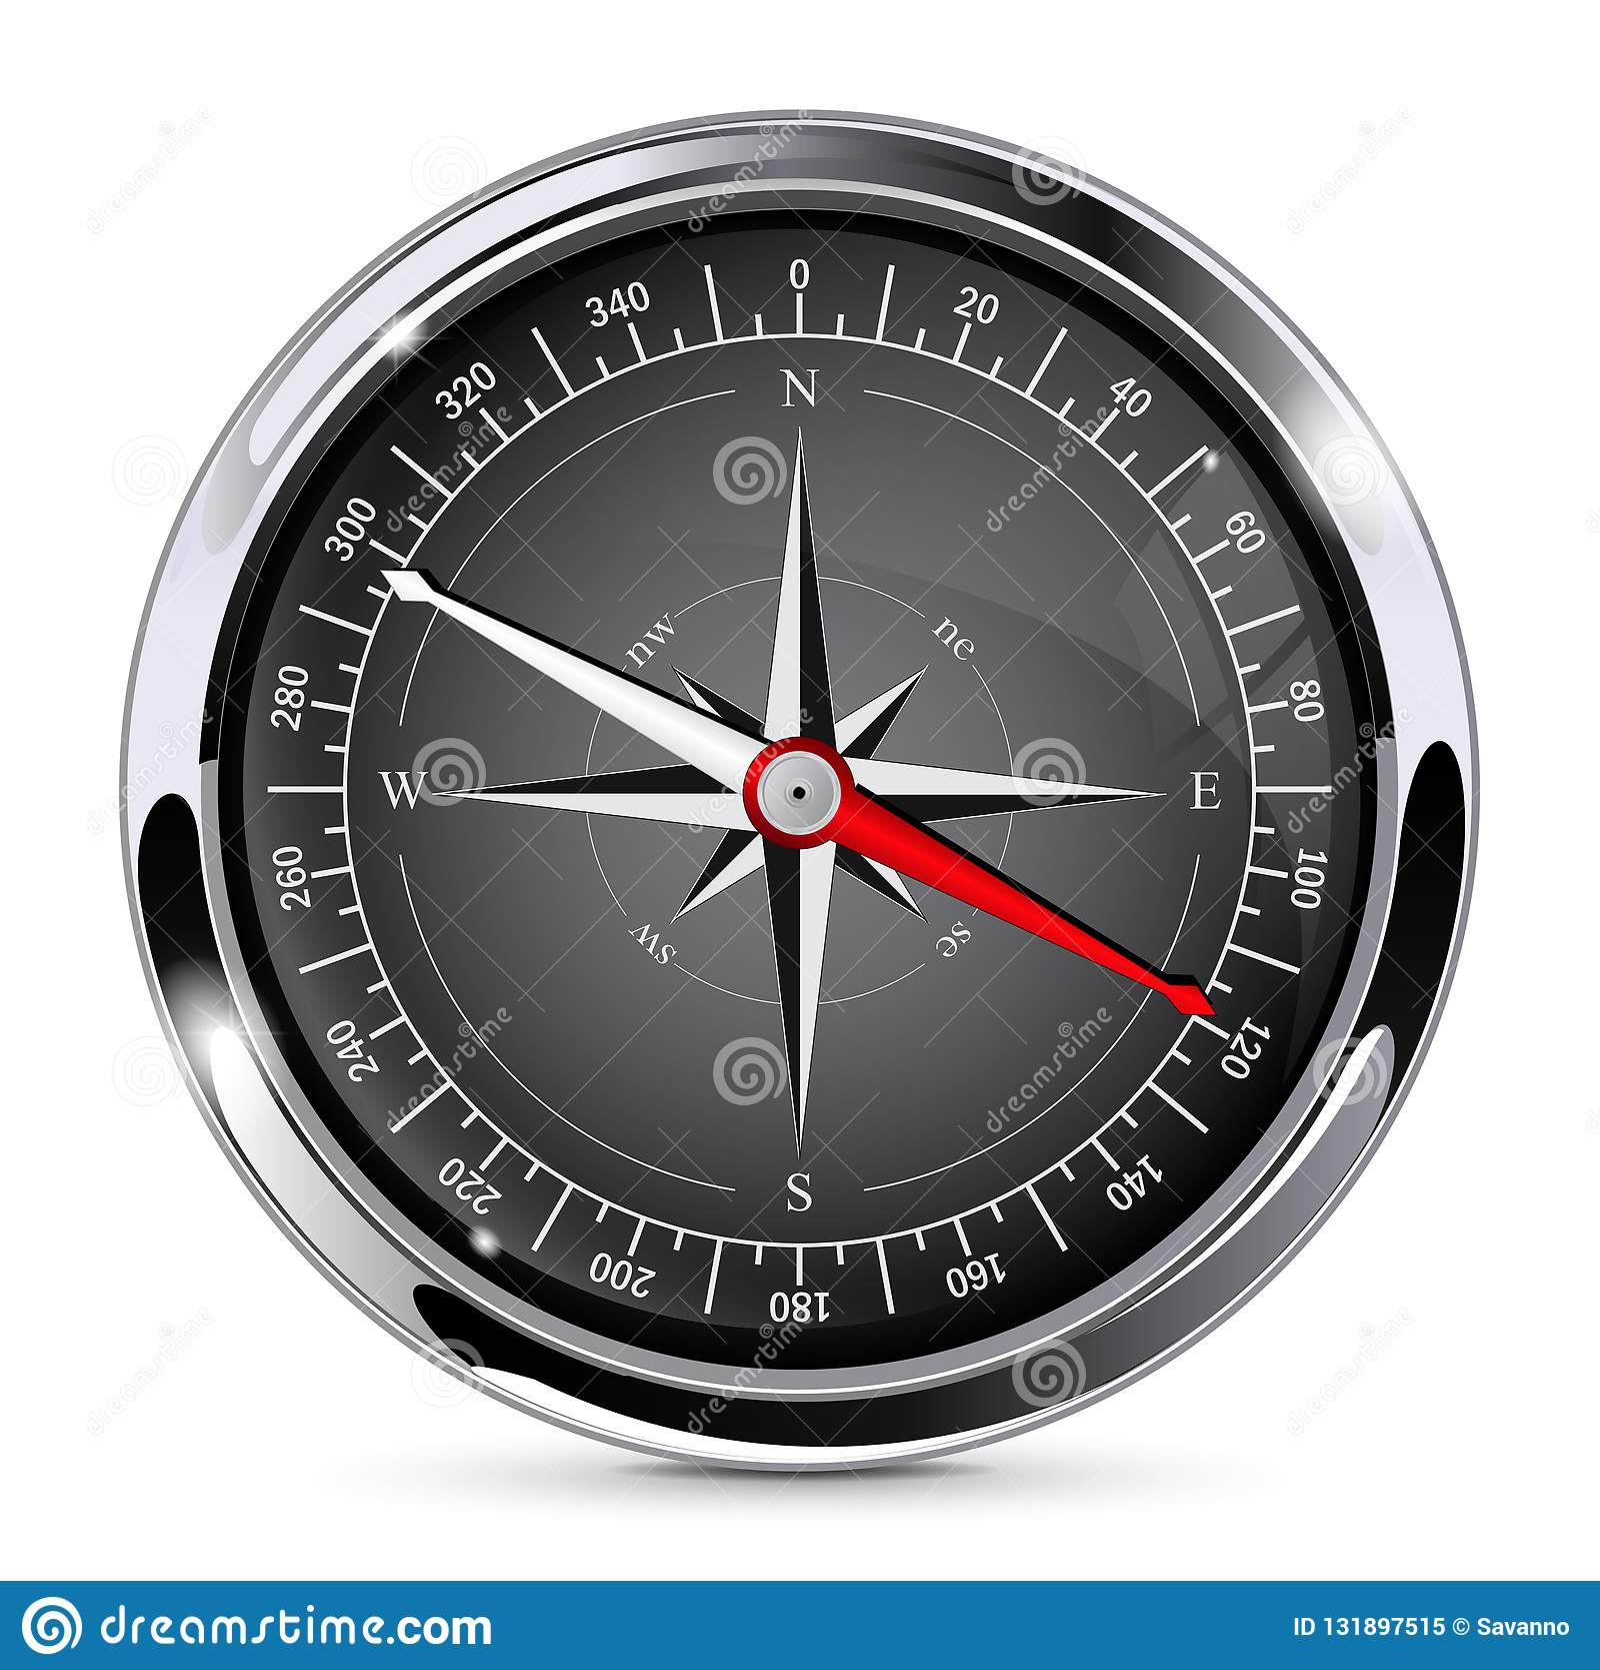 Kompass som bakgrund kan inramning metallbruk